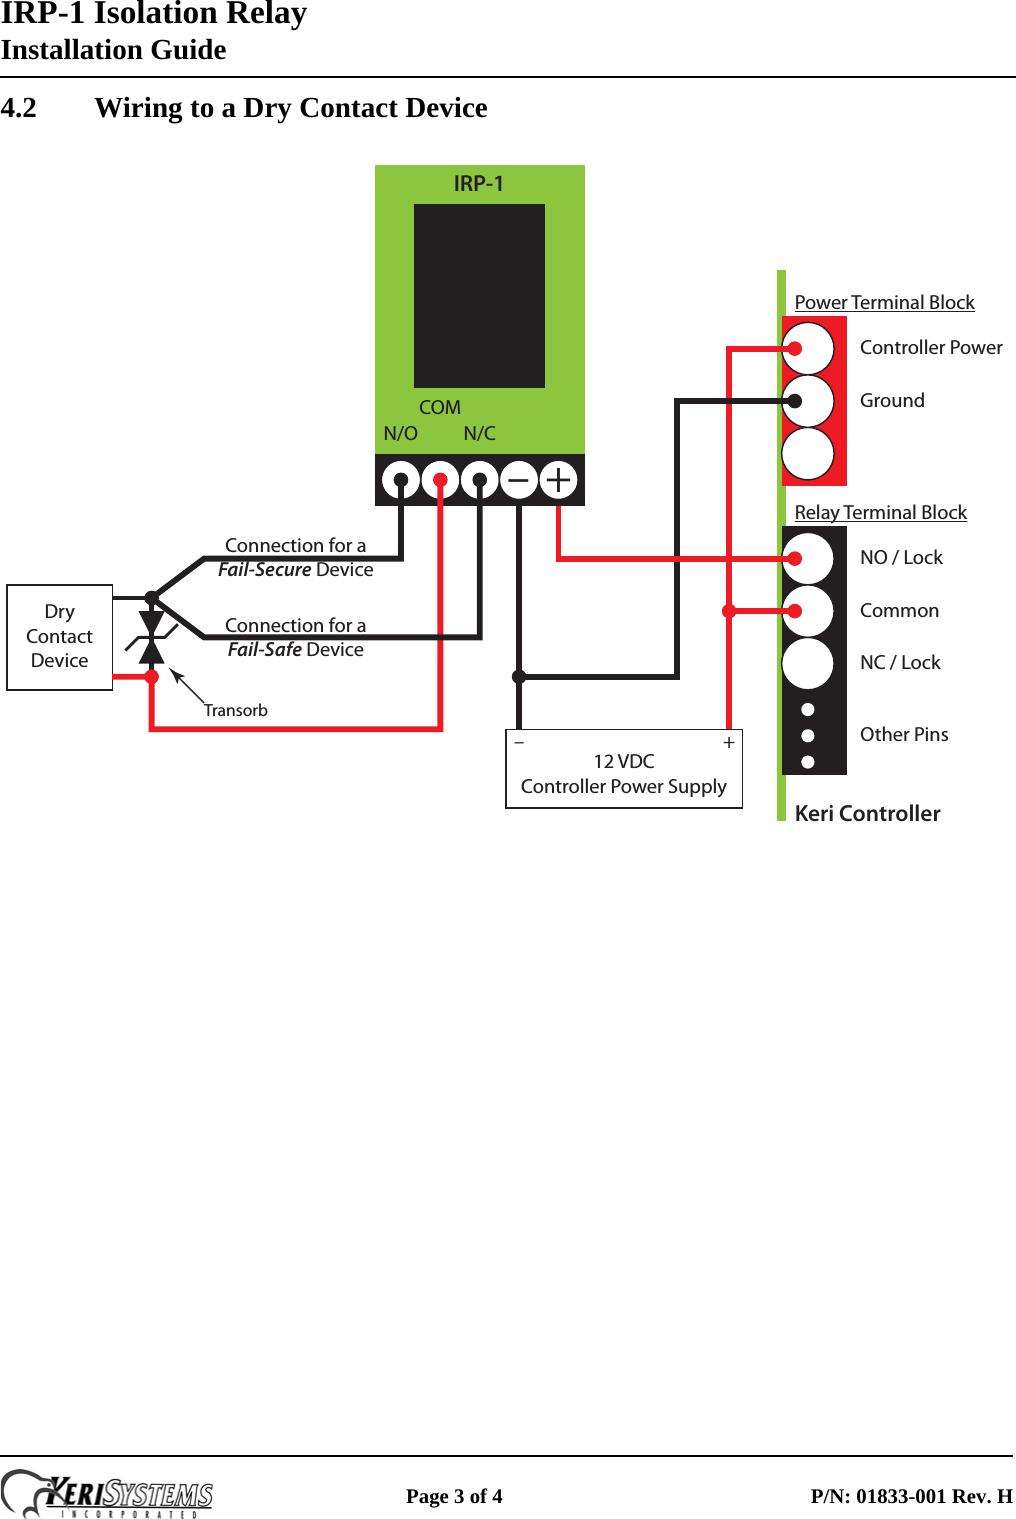 Battery Isolator Relay Broken Manual Guide